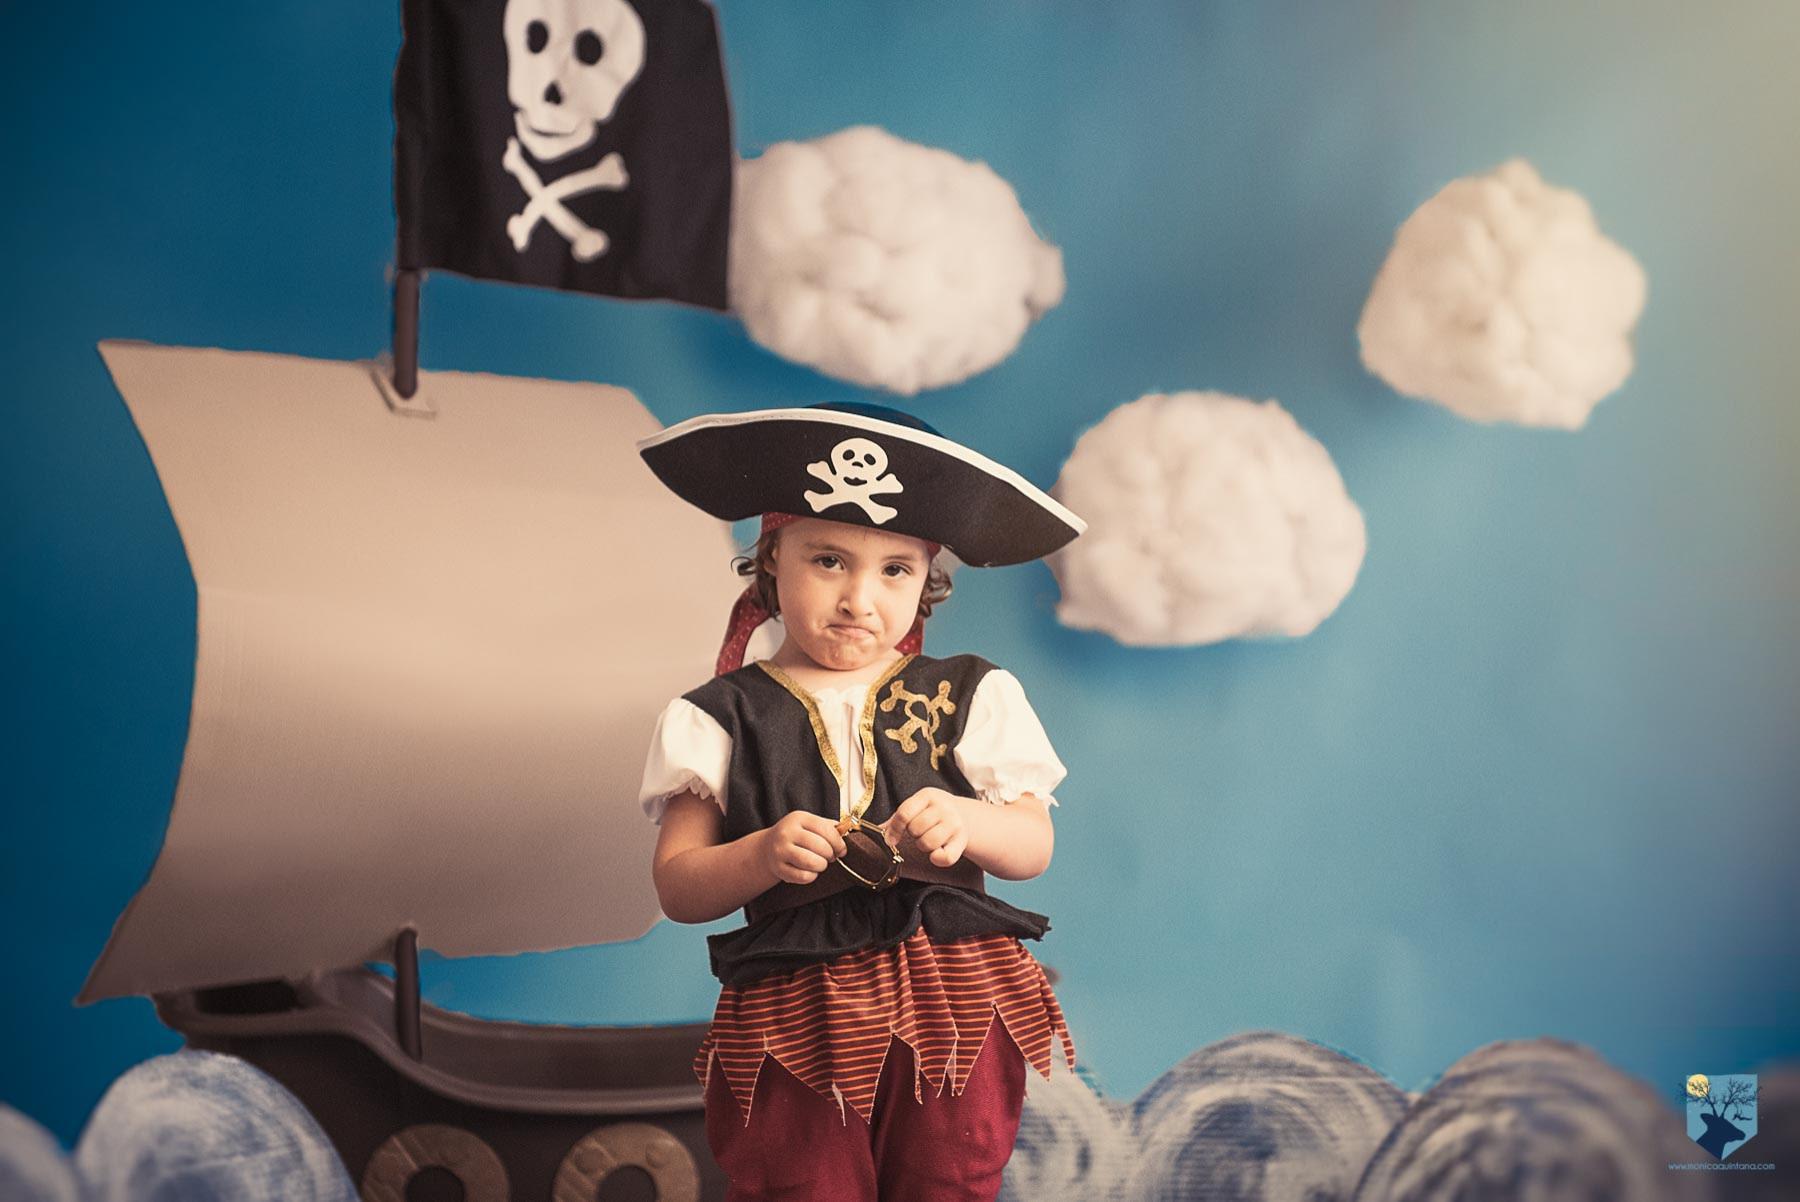 fotografia fotos girona figueres emporda monica quintana niños niñas familia retrato estudio minis verano piratas promocion